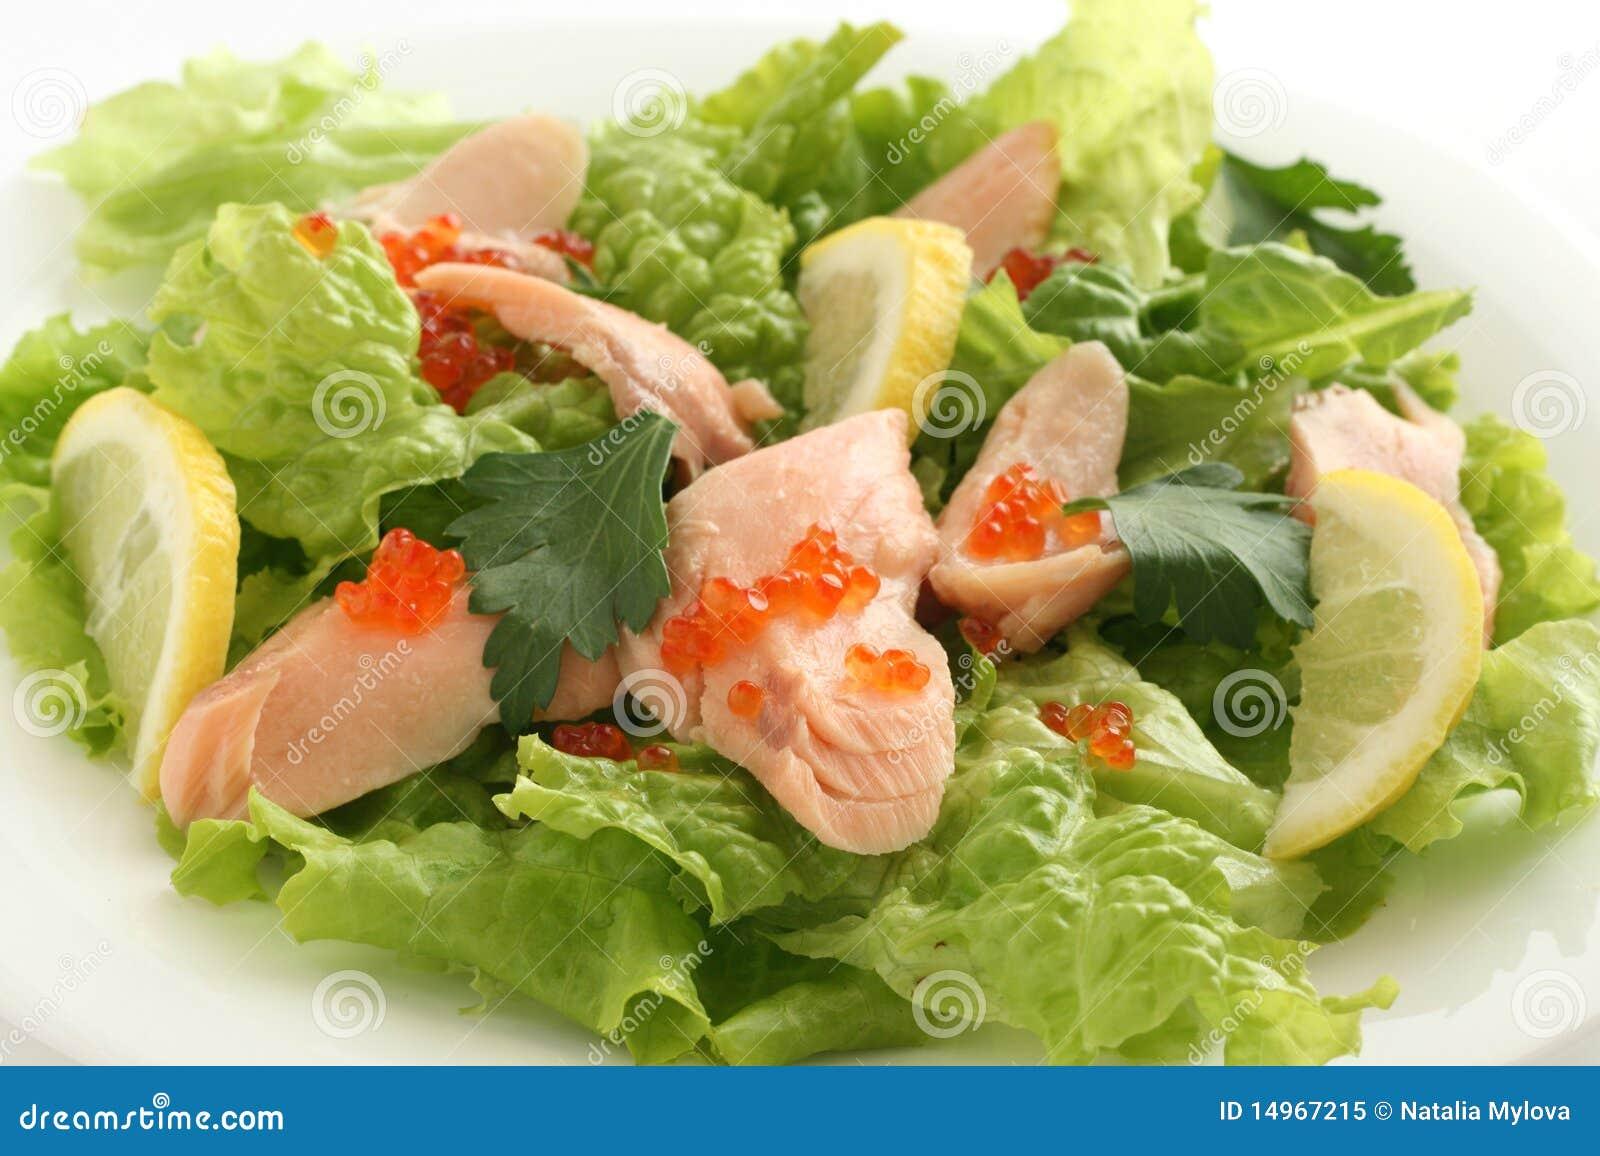 Download Salmon salad with caviar stock image. Image of prepared - 14967215